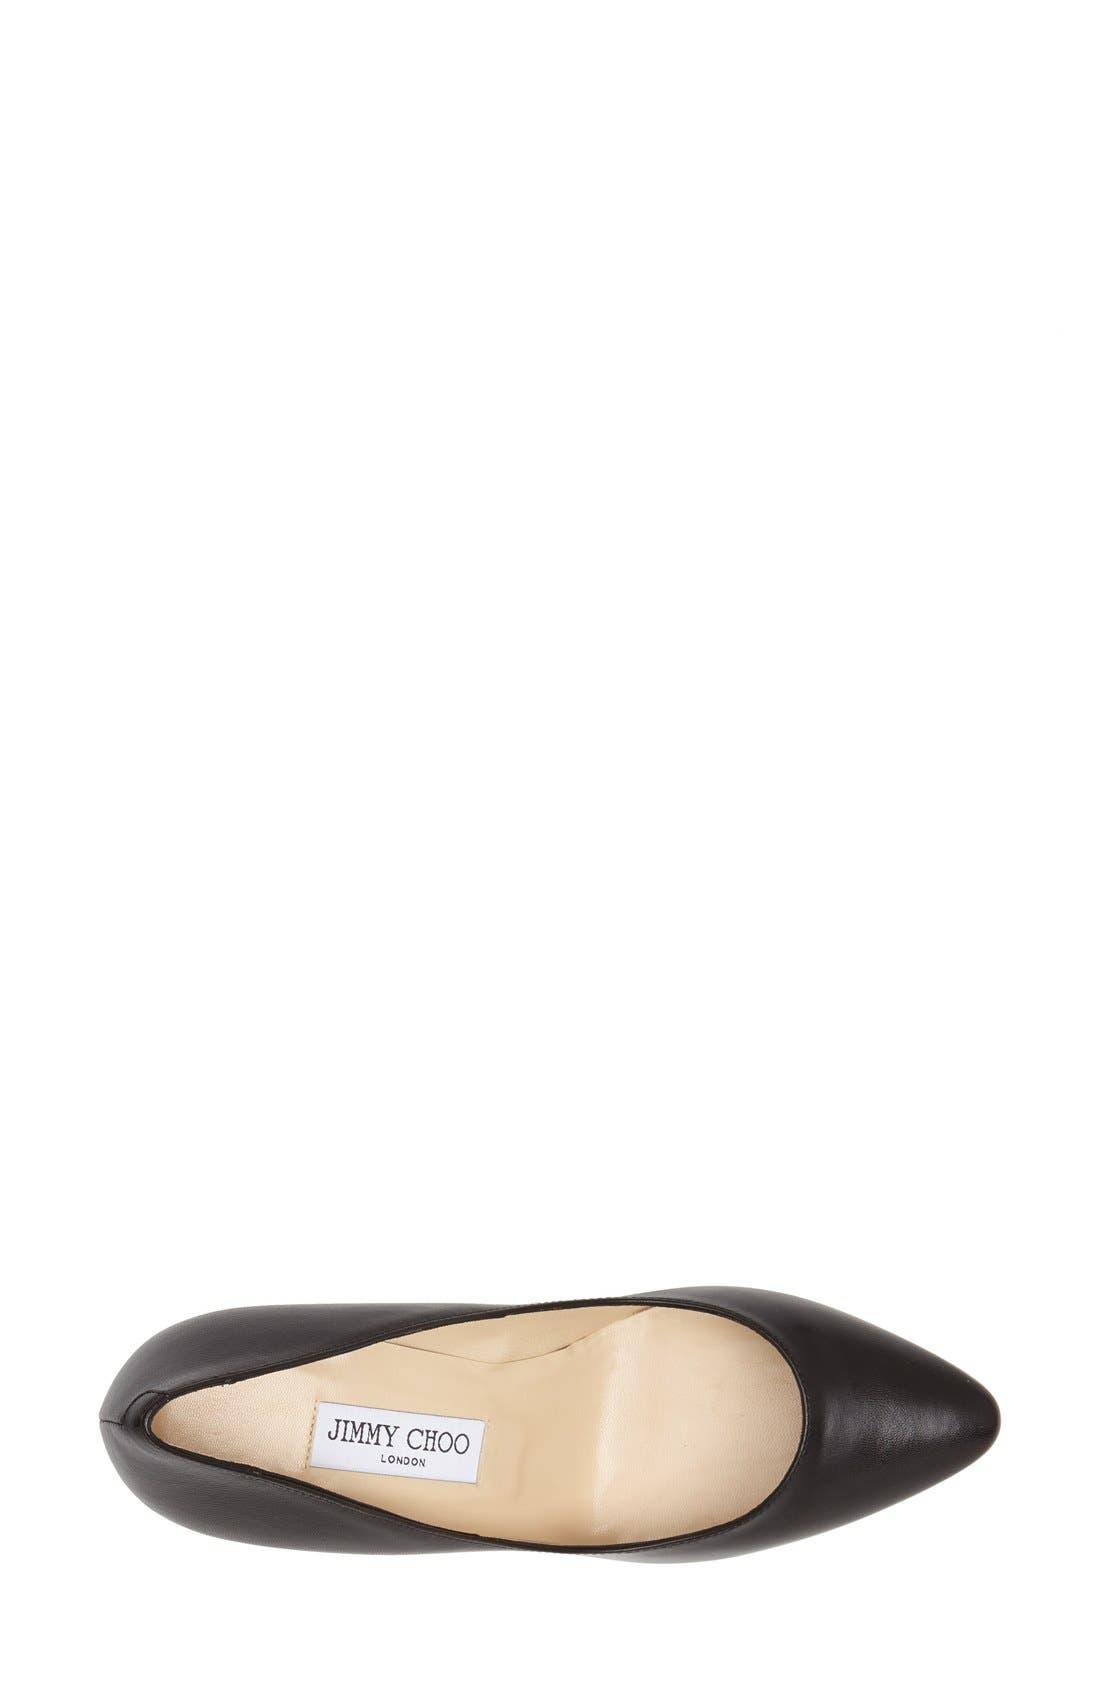 JIMMY CHOO, 'Mei' Almond Toe Leather Pump, Alternate thumbnail 2, color, 001